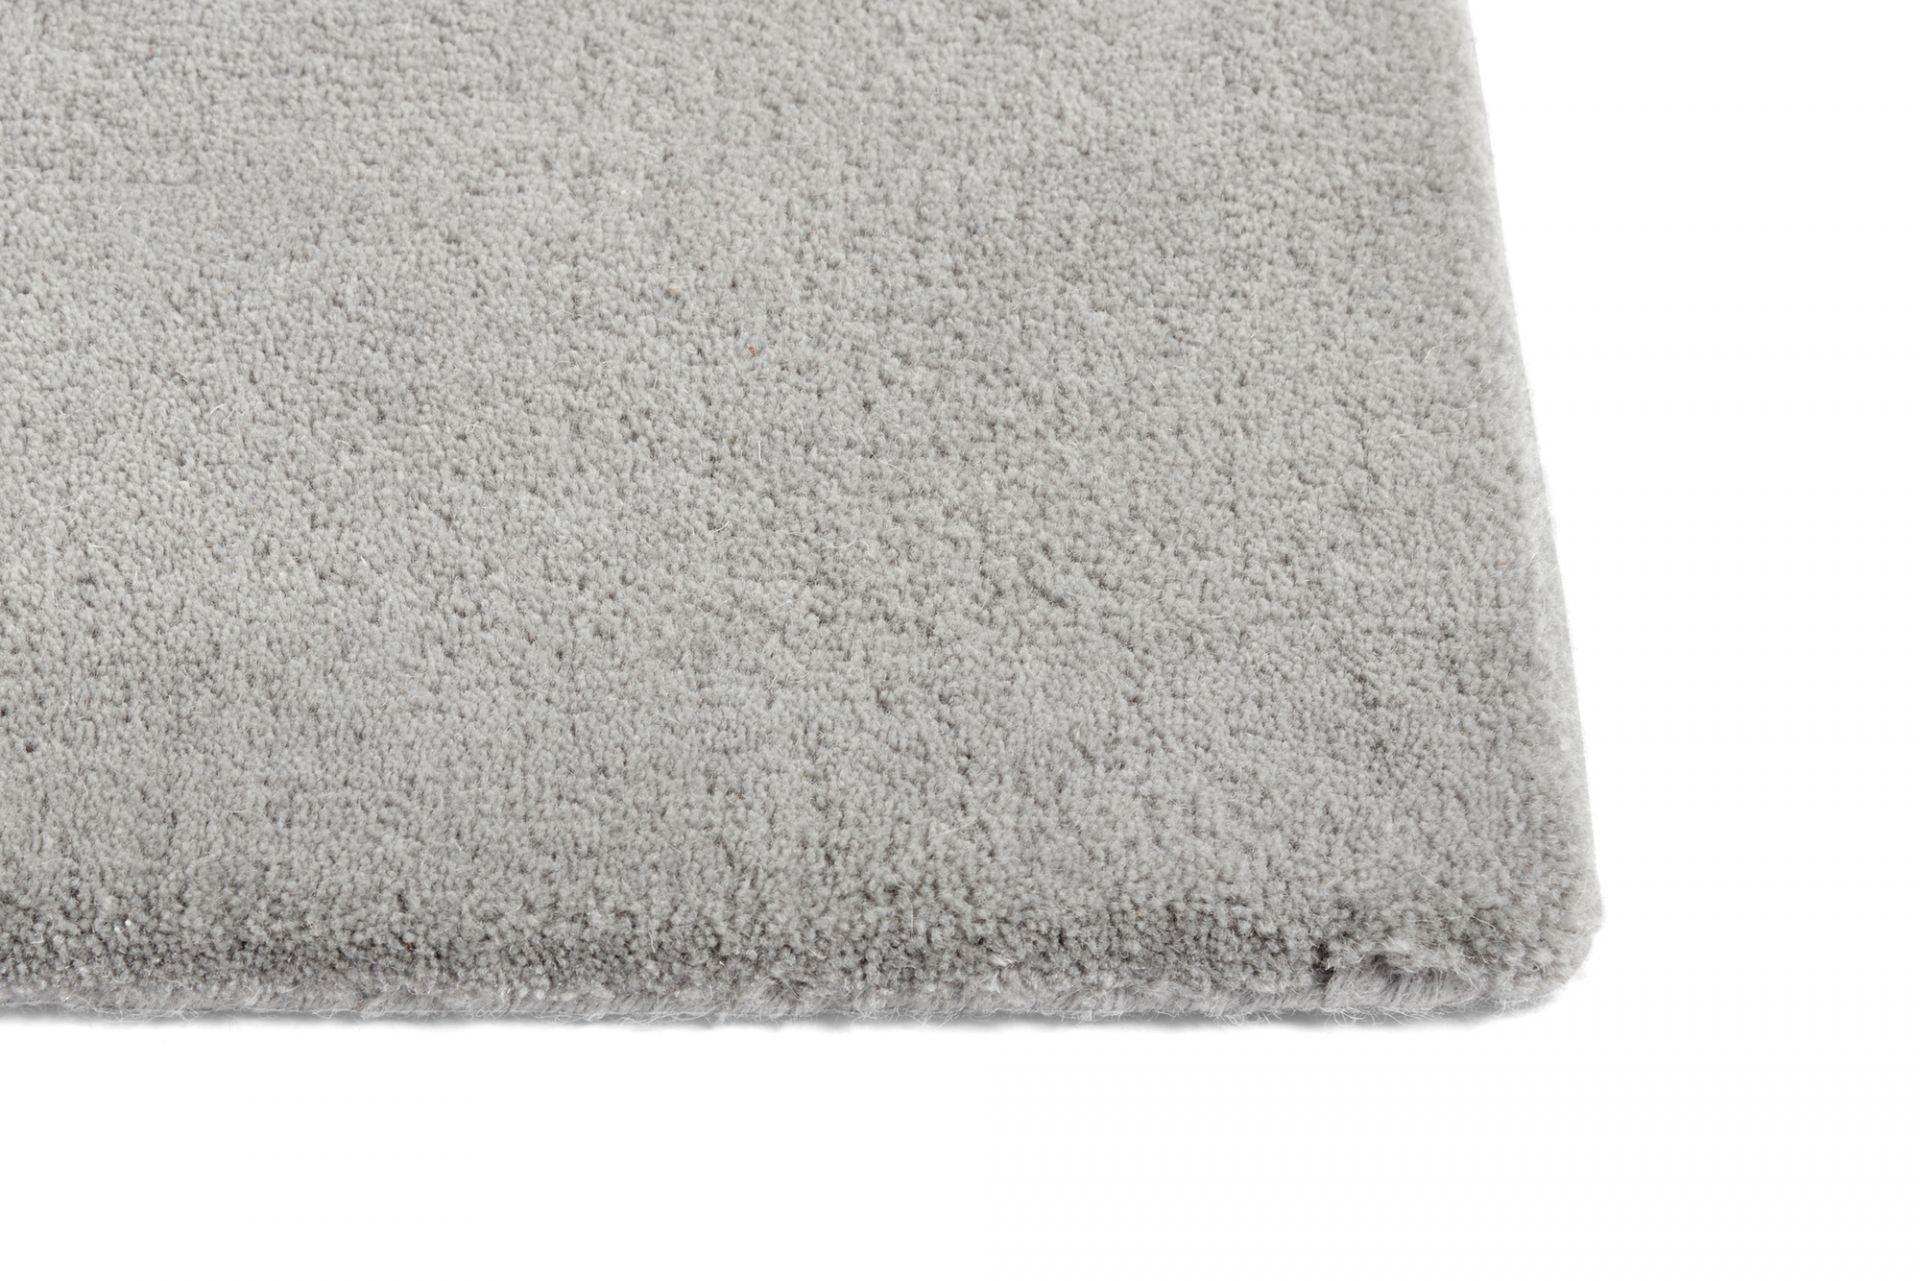 Raw Rug No 2 Carpet L 200 x B 80 cm light grey Hay